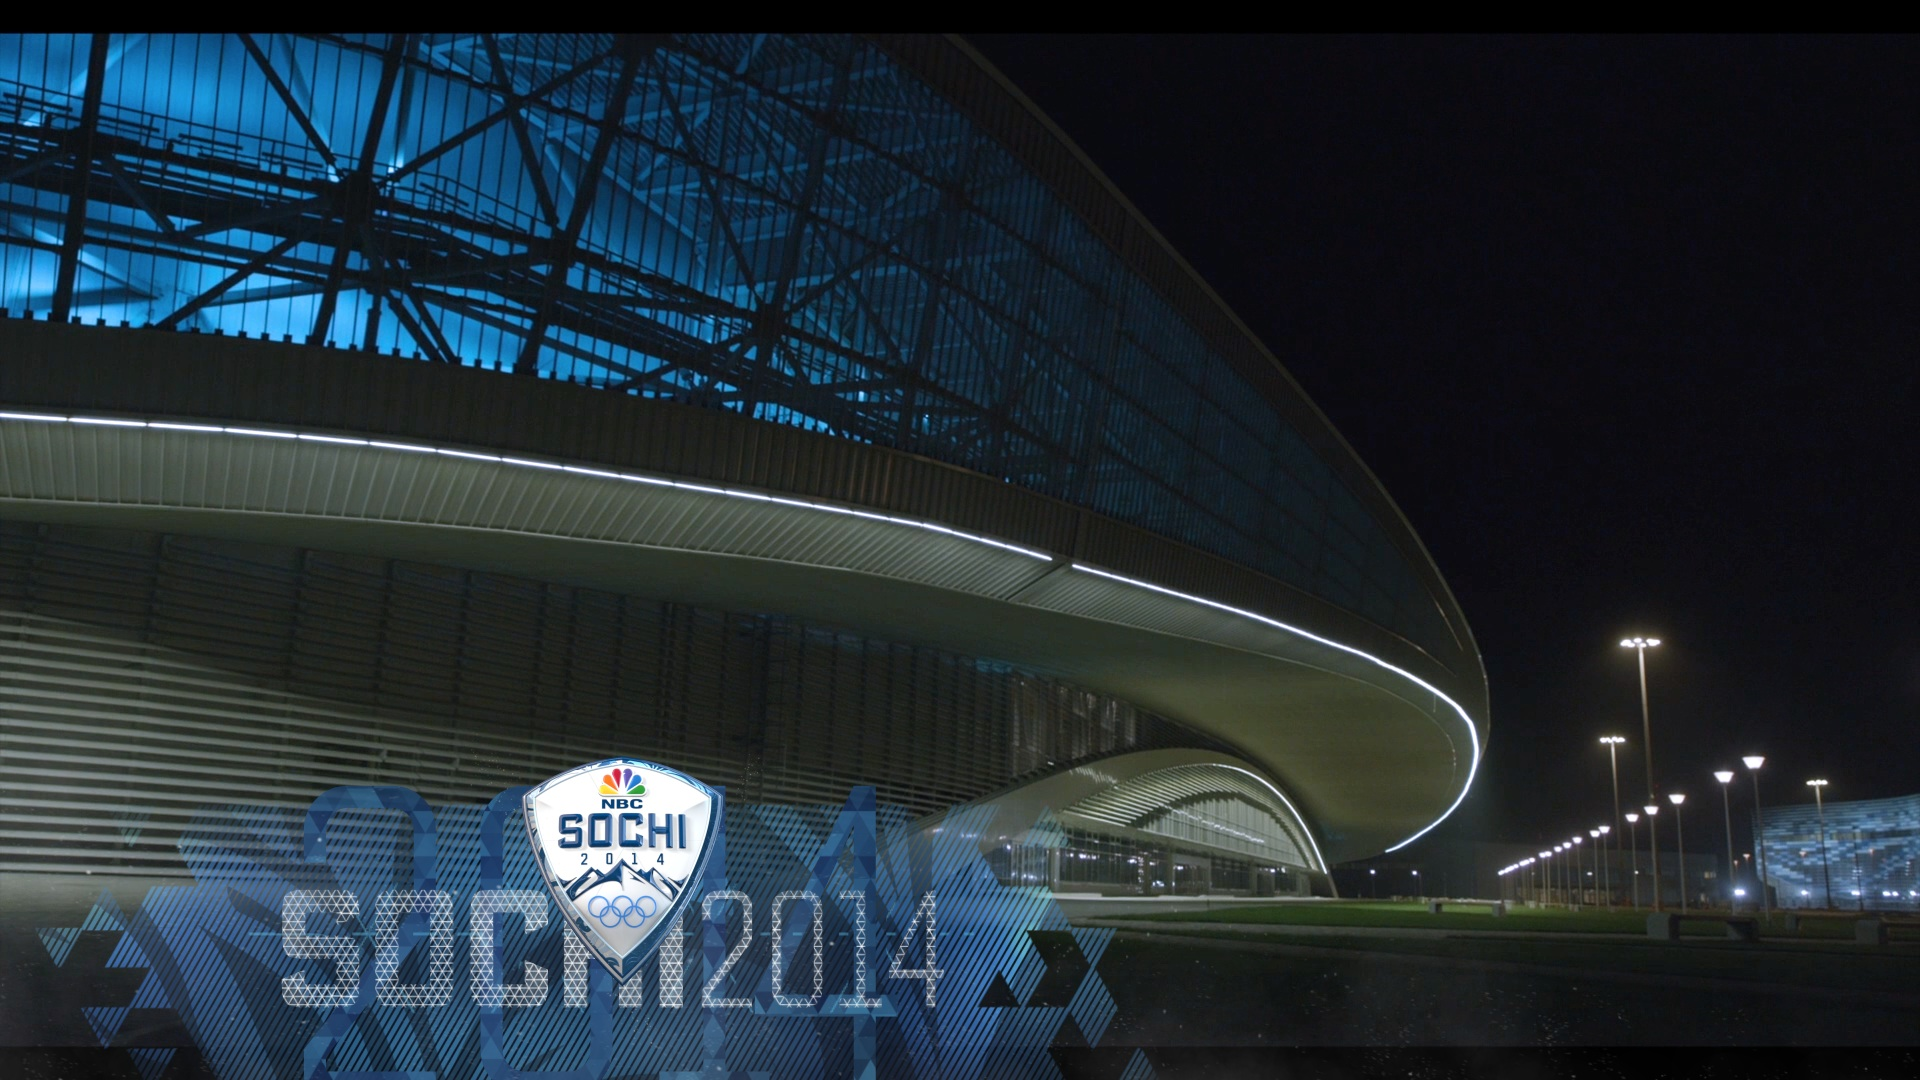 Sochi_9.jpg